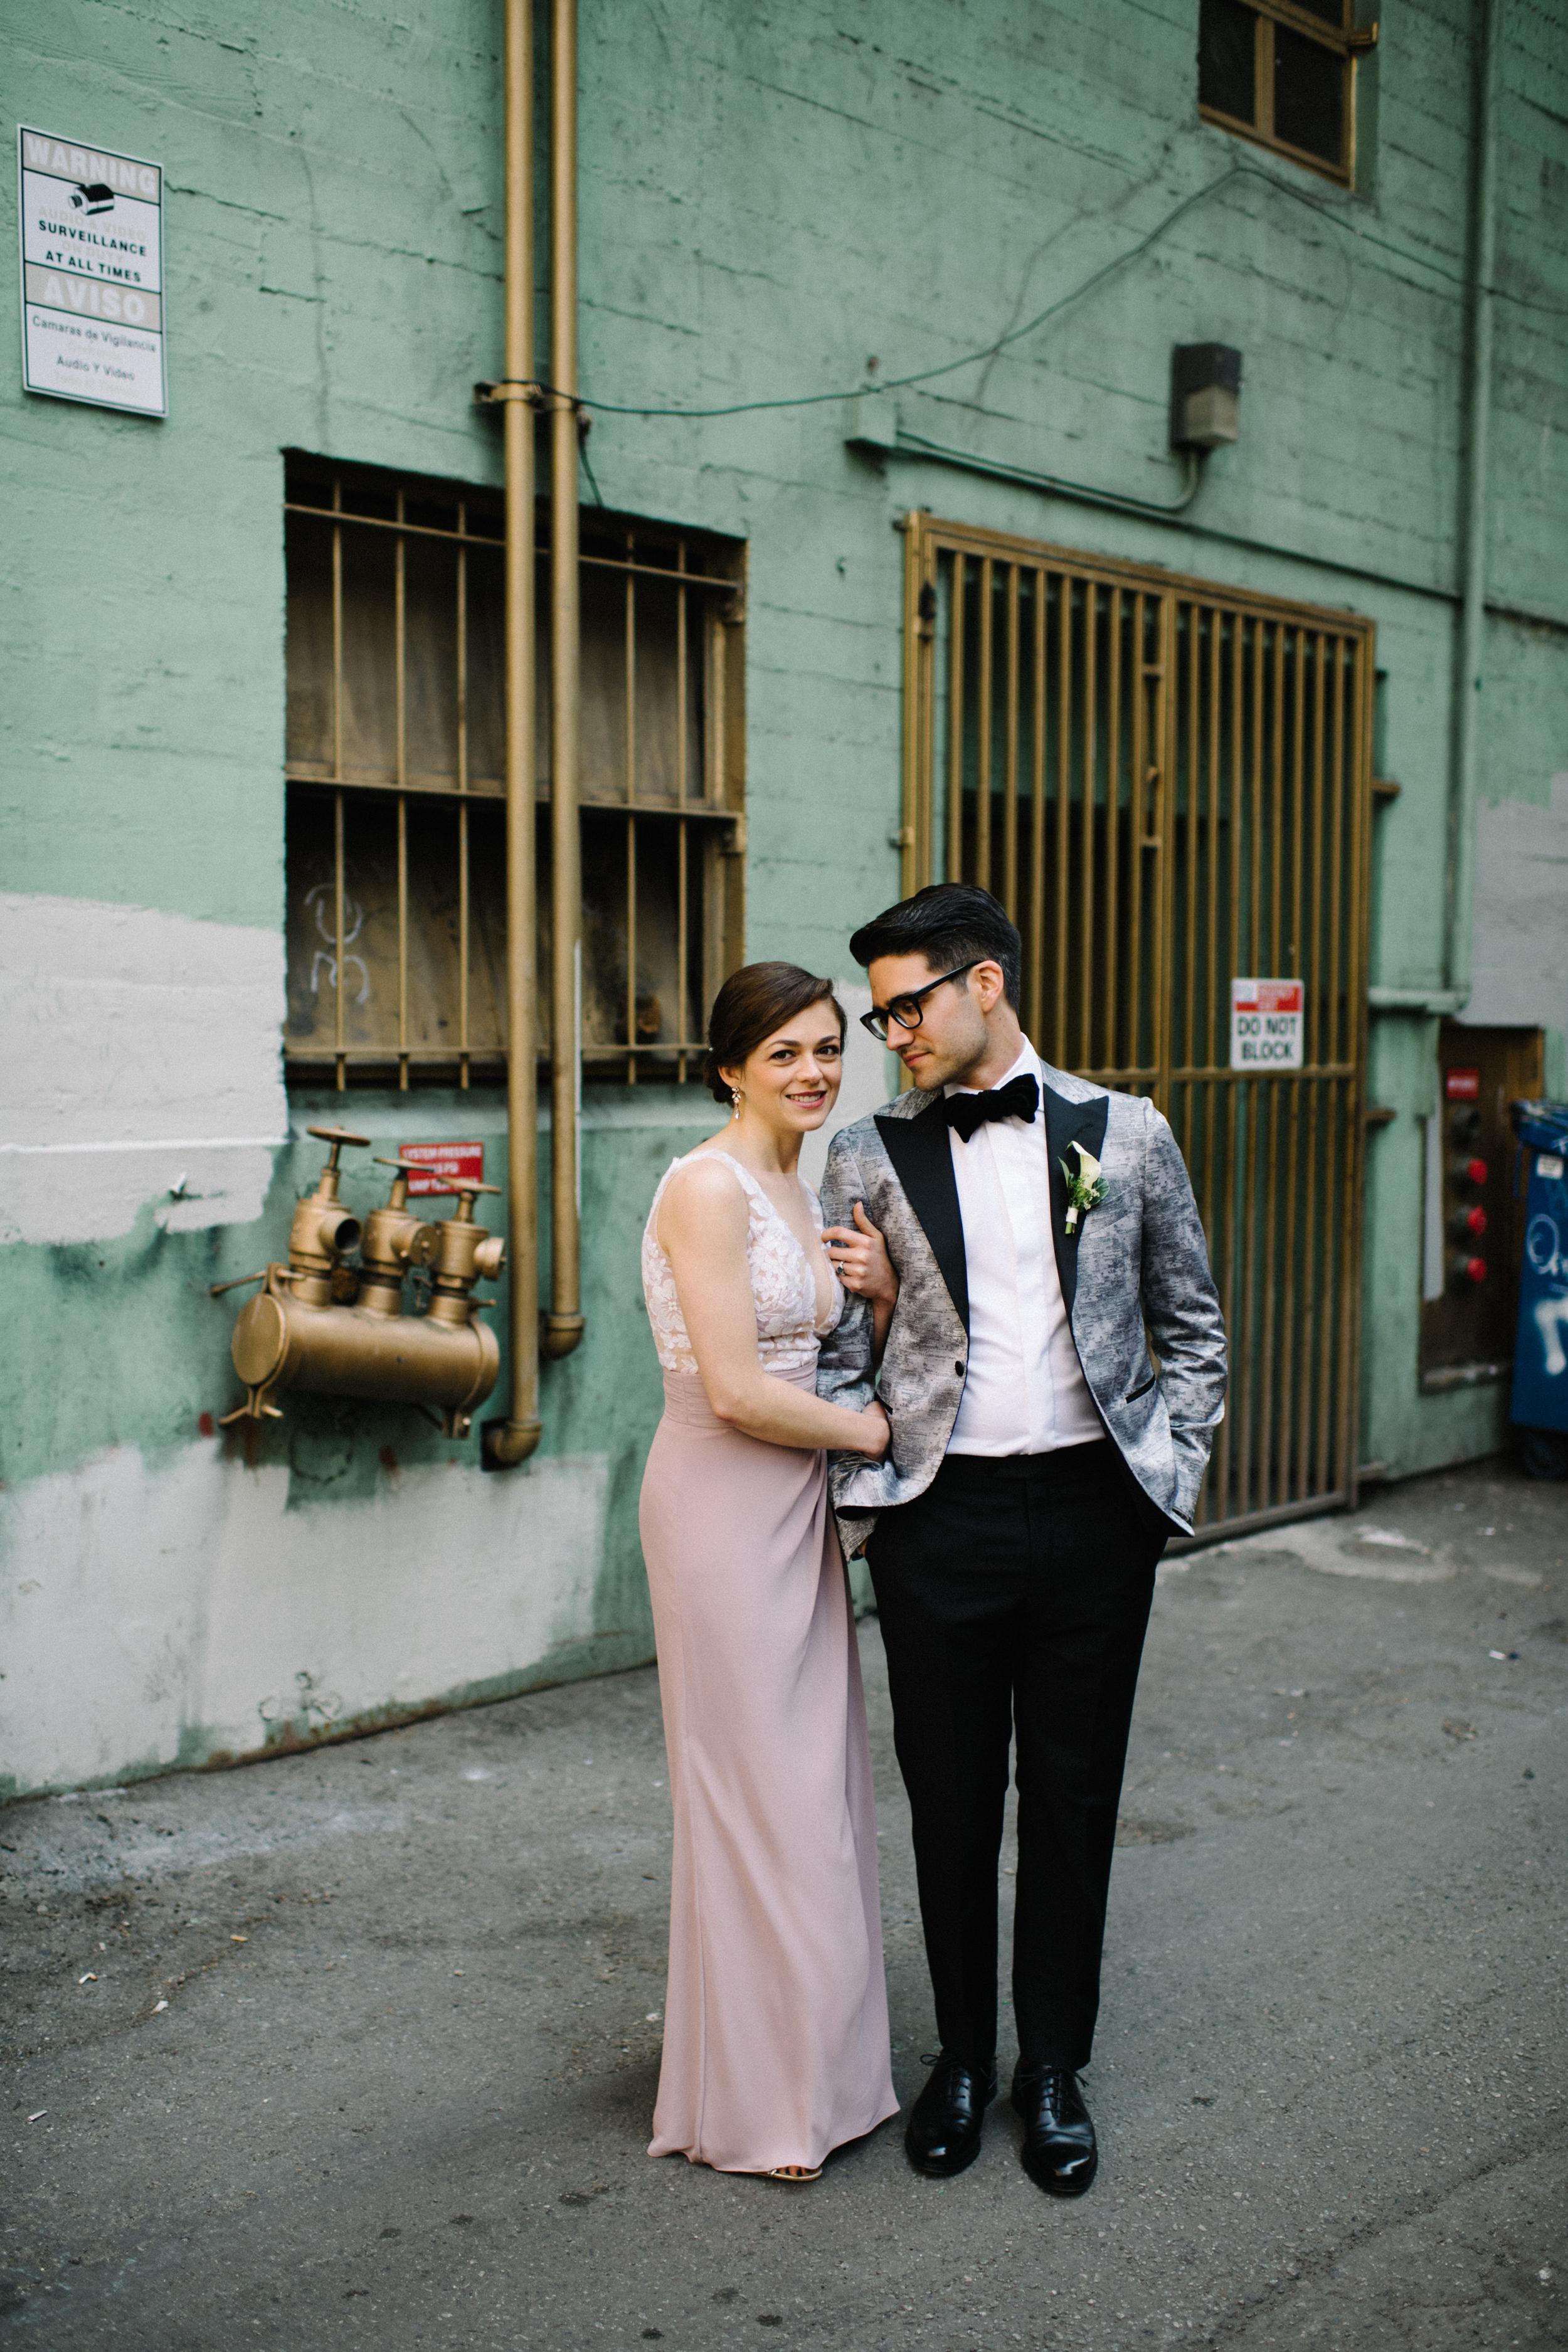 wedding_millwick_los_angeles-19.jpg